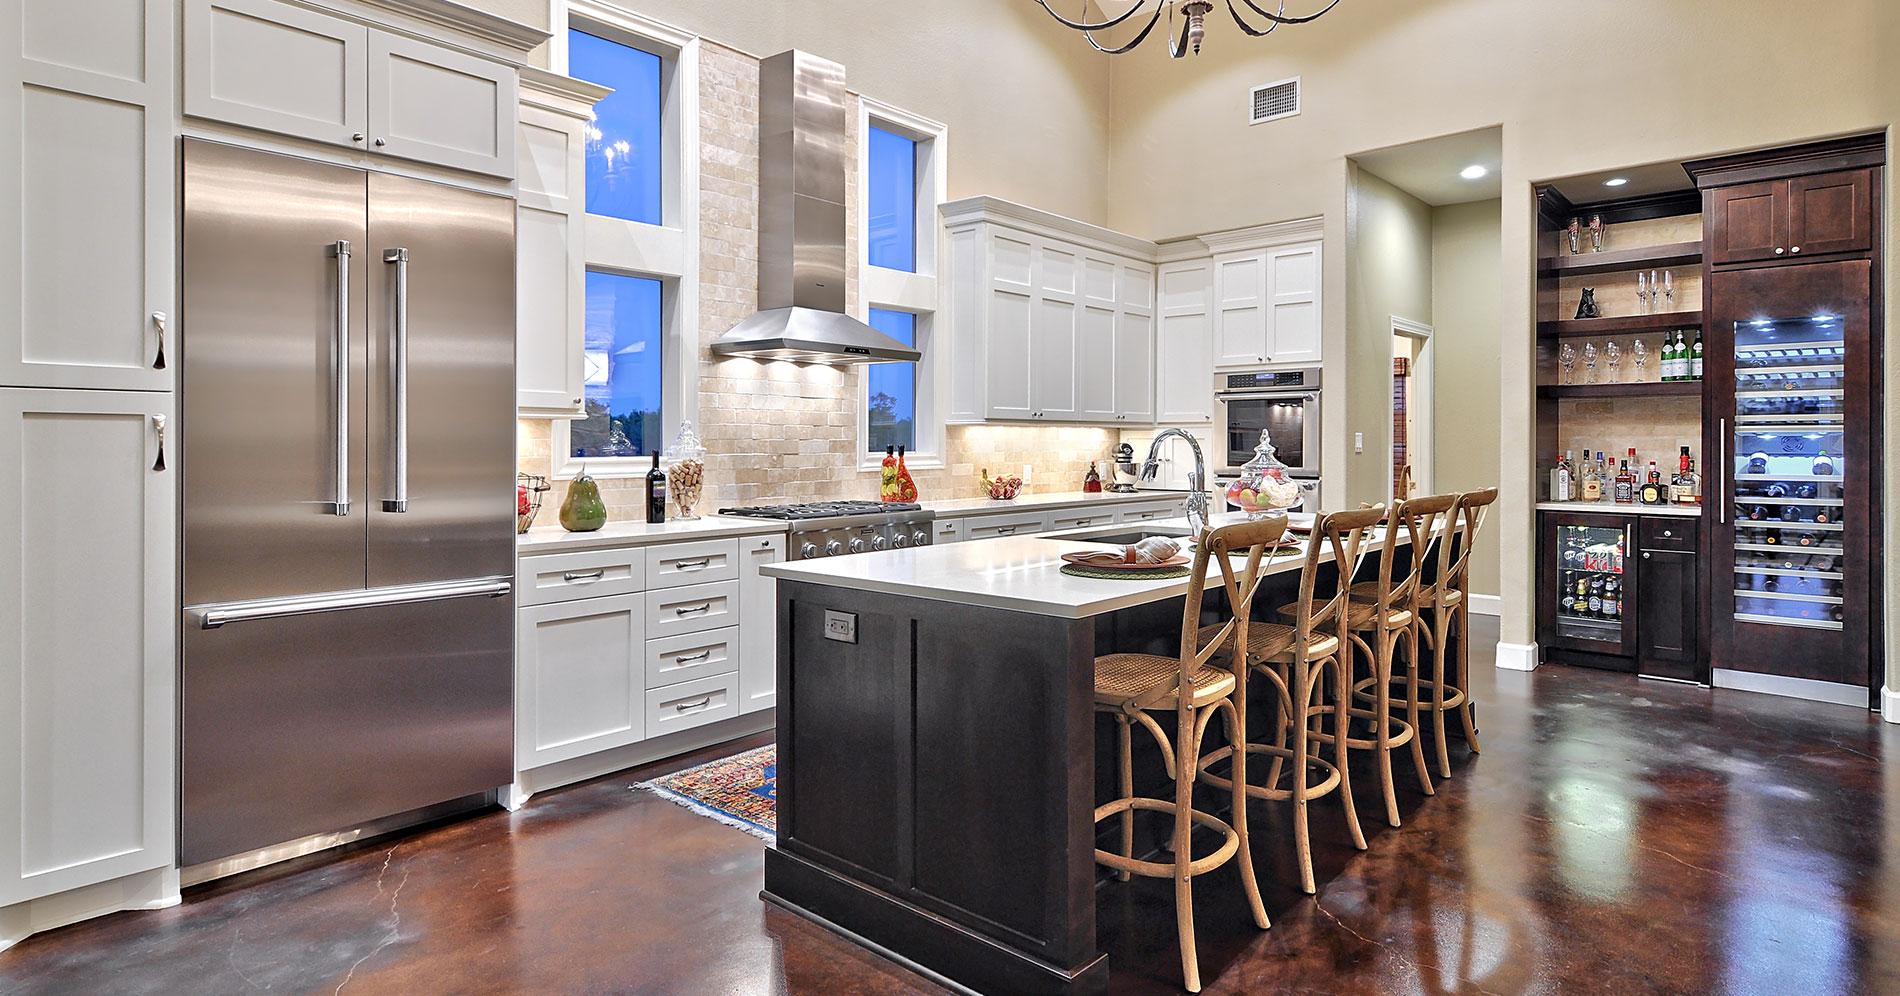 Best designs for kitchens laundry and fireplaces kustom for Kustom kitchens